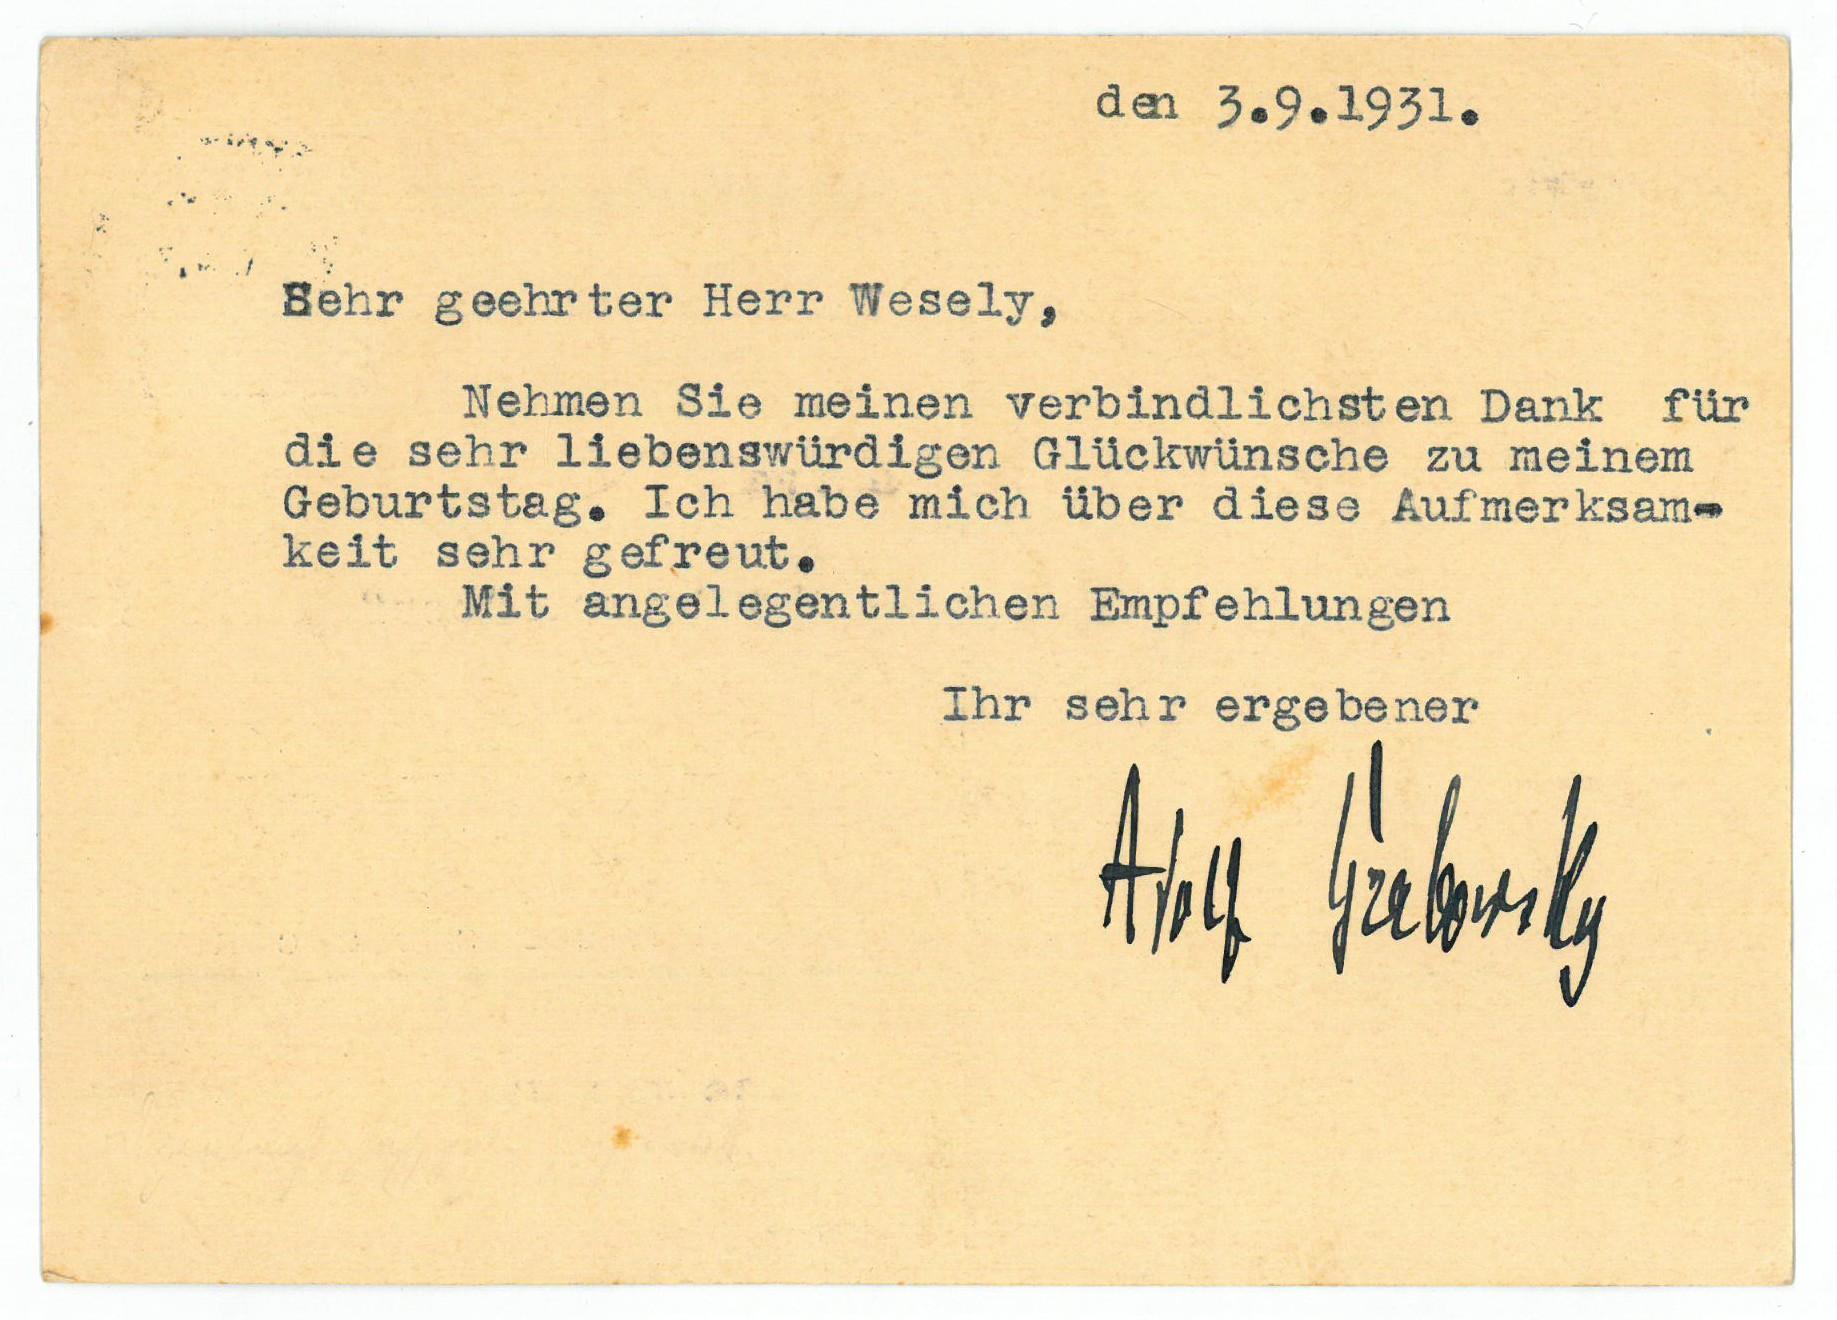 Adolf Grabowsky